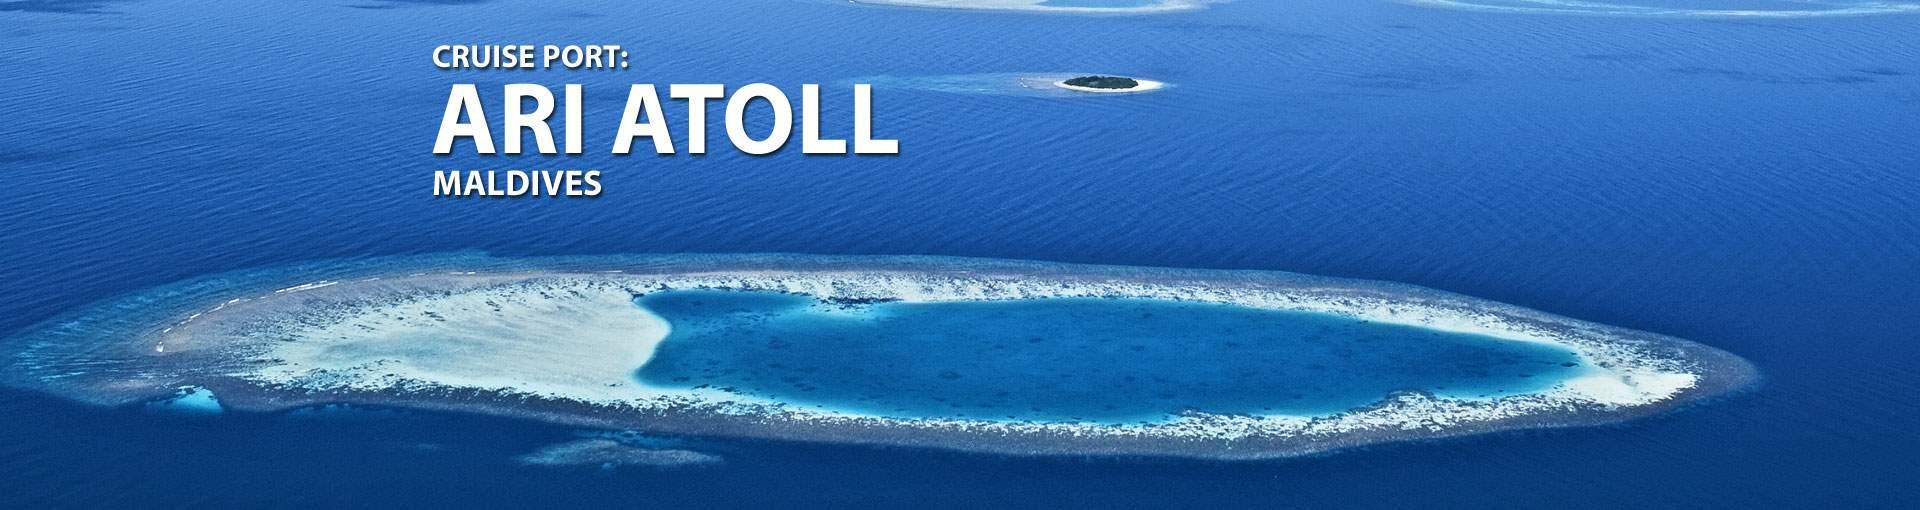 Cruises to Ari Atoll, Maldives